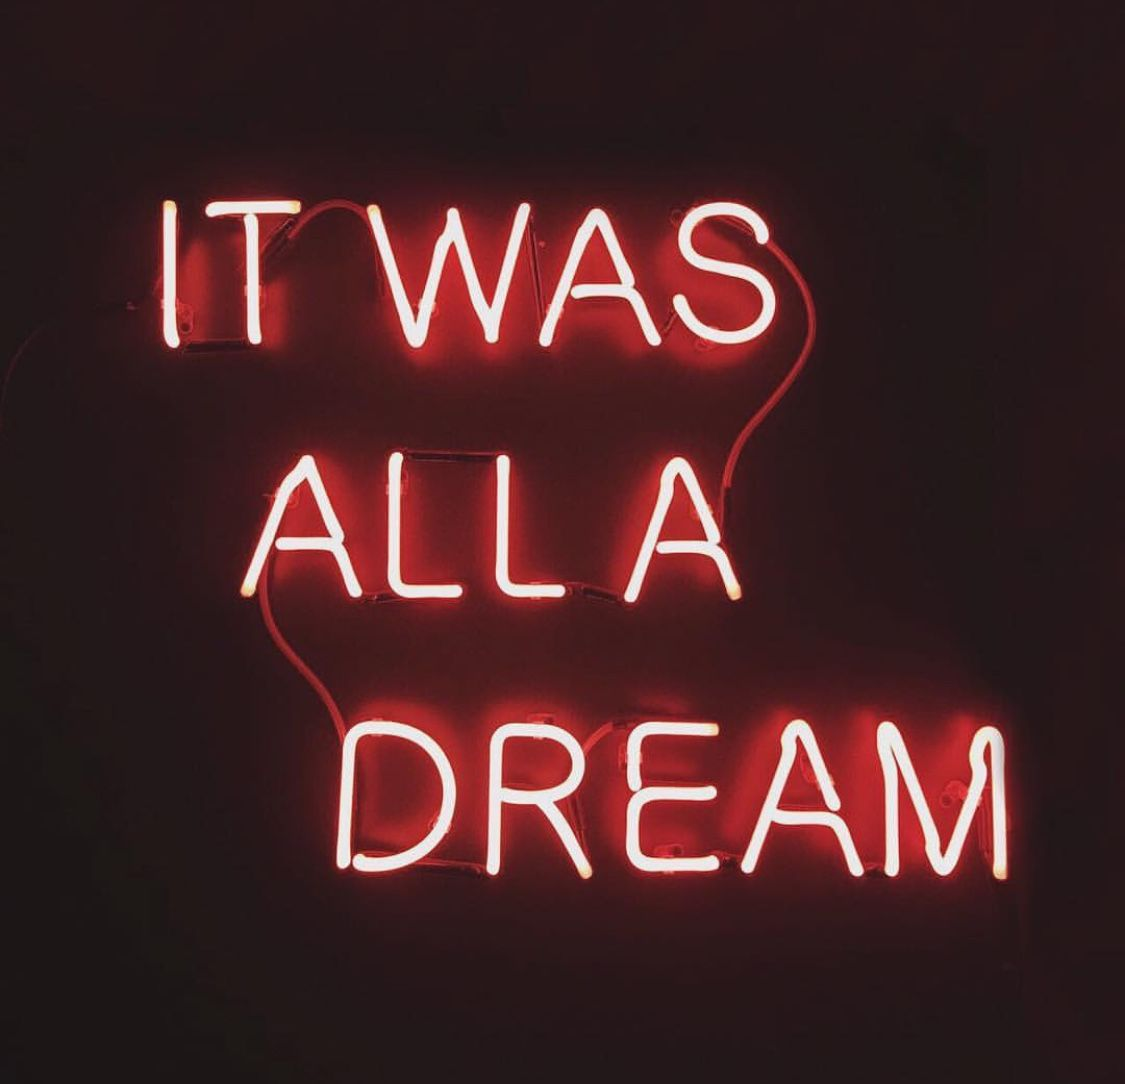 It Was All A Dream Neon Sign Impressive Dream Lights  Pinterest  Neon Decorating Inspiration